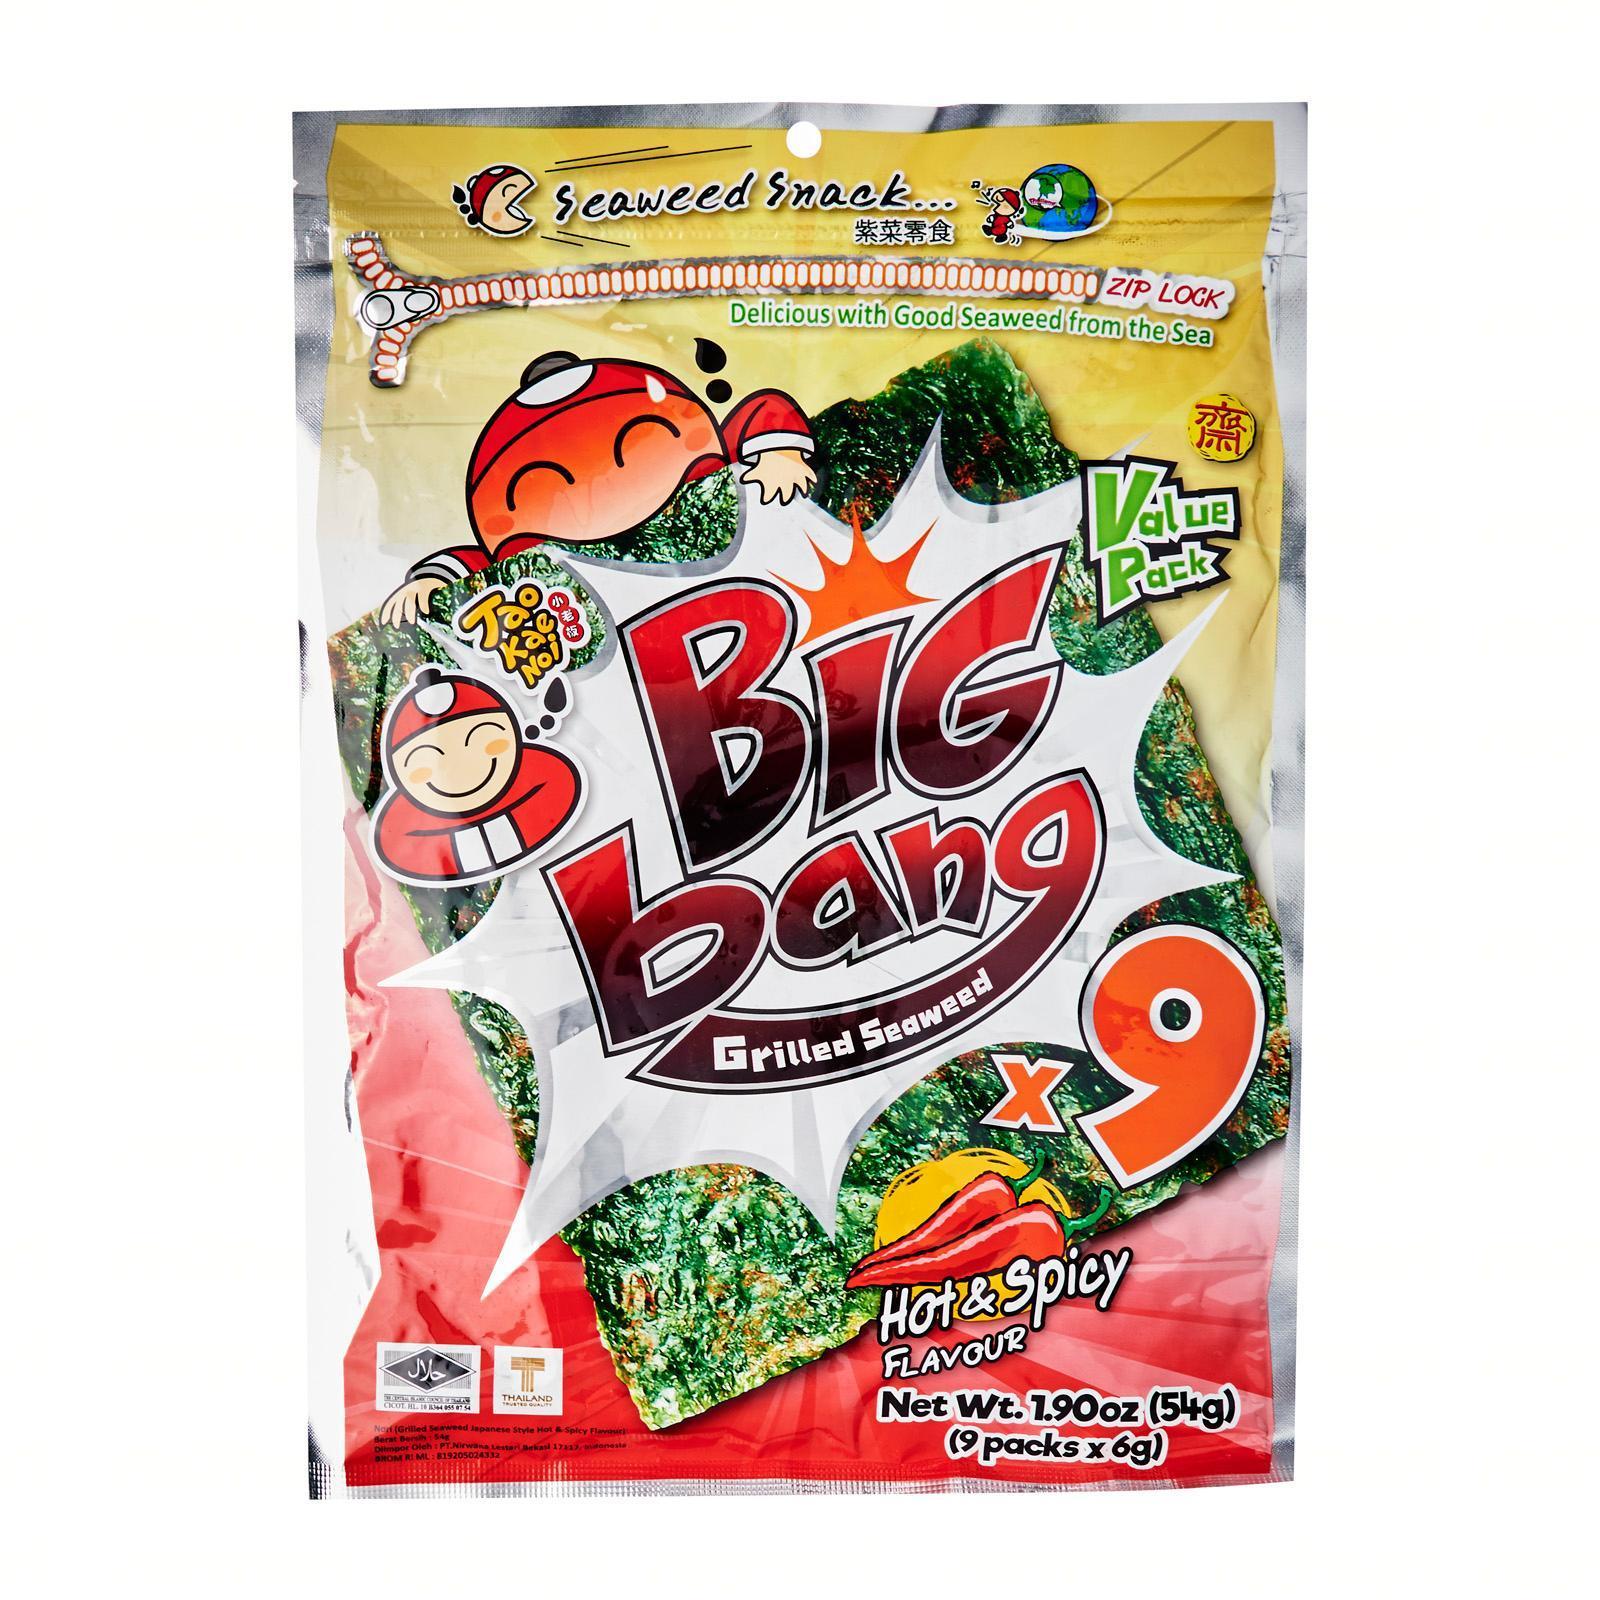 Tao Kae Noi Big bang Grilled Seaweed - Hot & Spicy Flavour